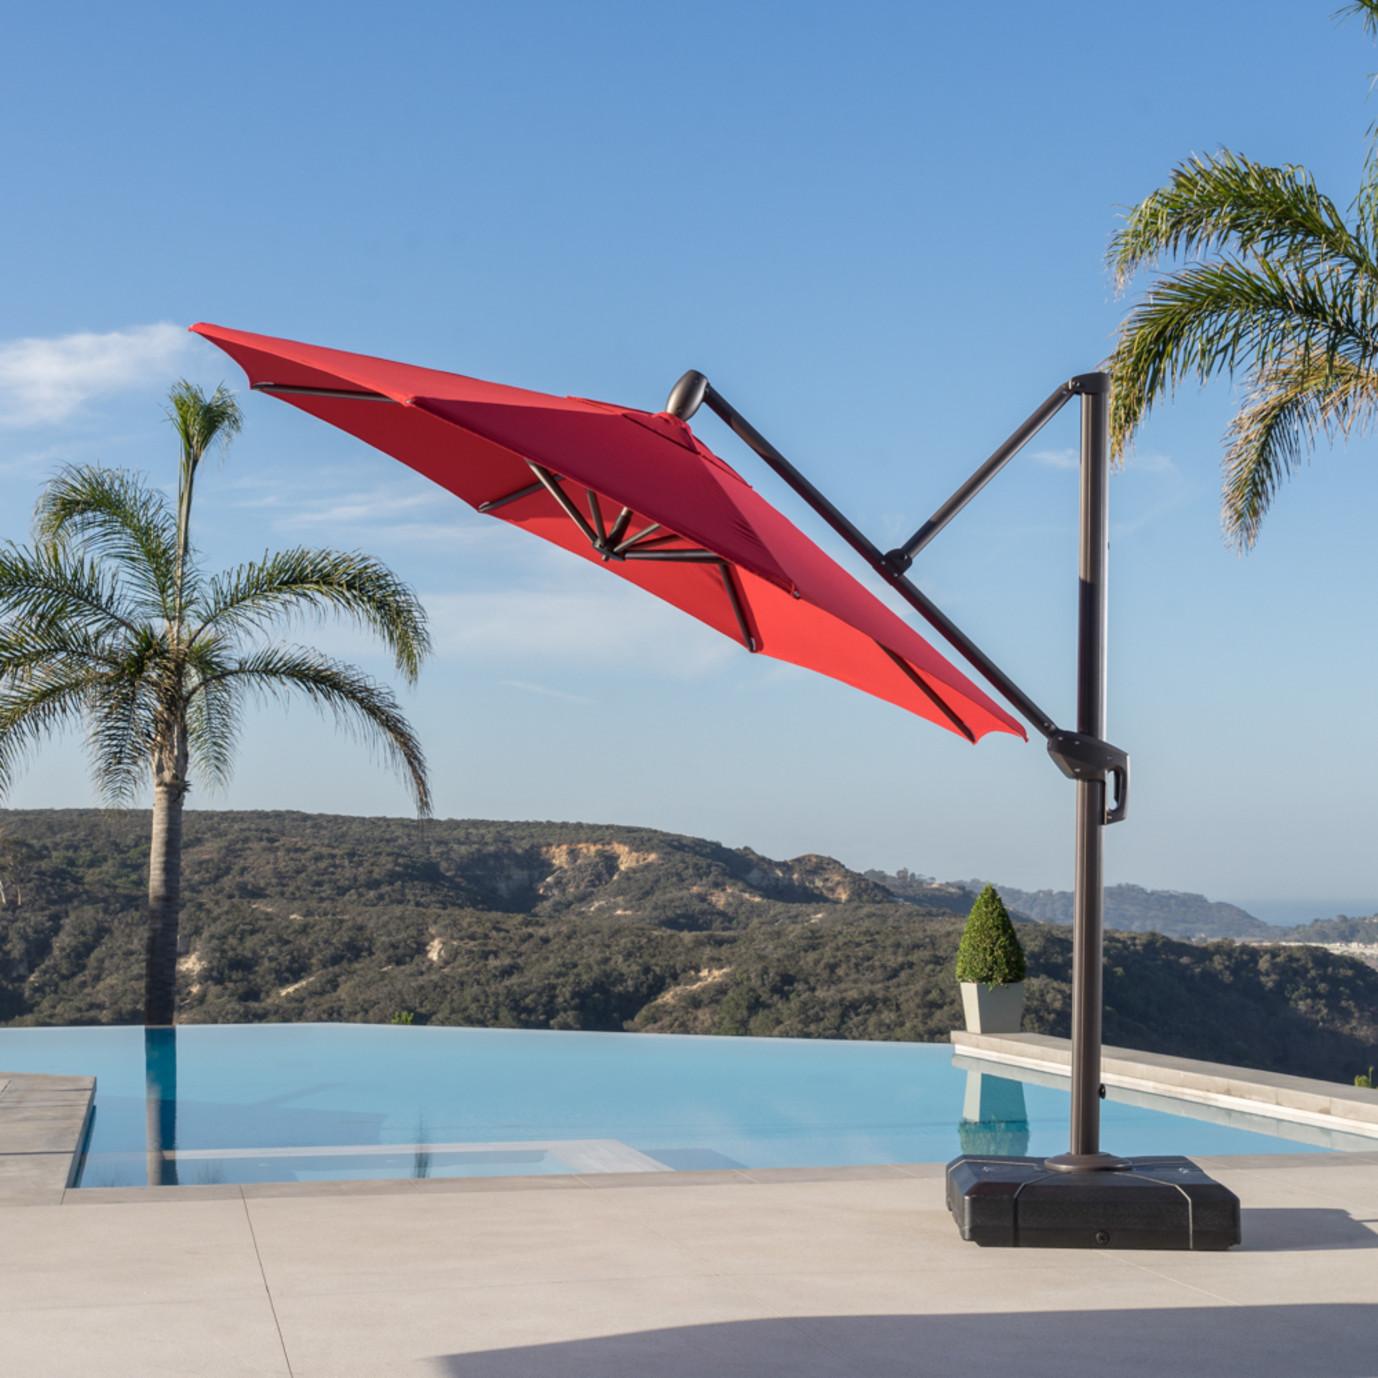 Modular Outdoor 10' Round Umbrella - Sunset Red